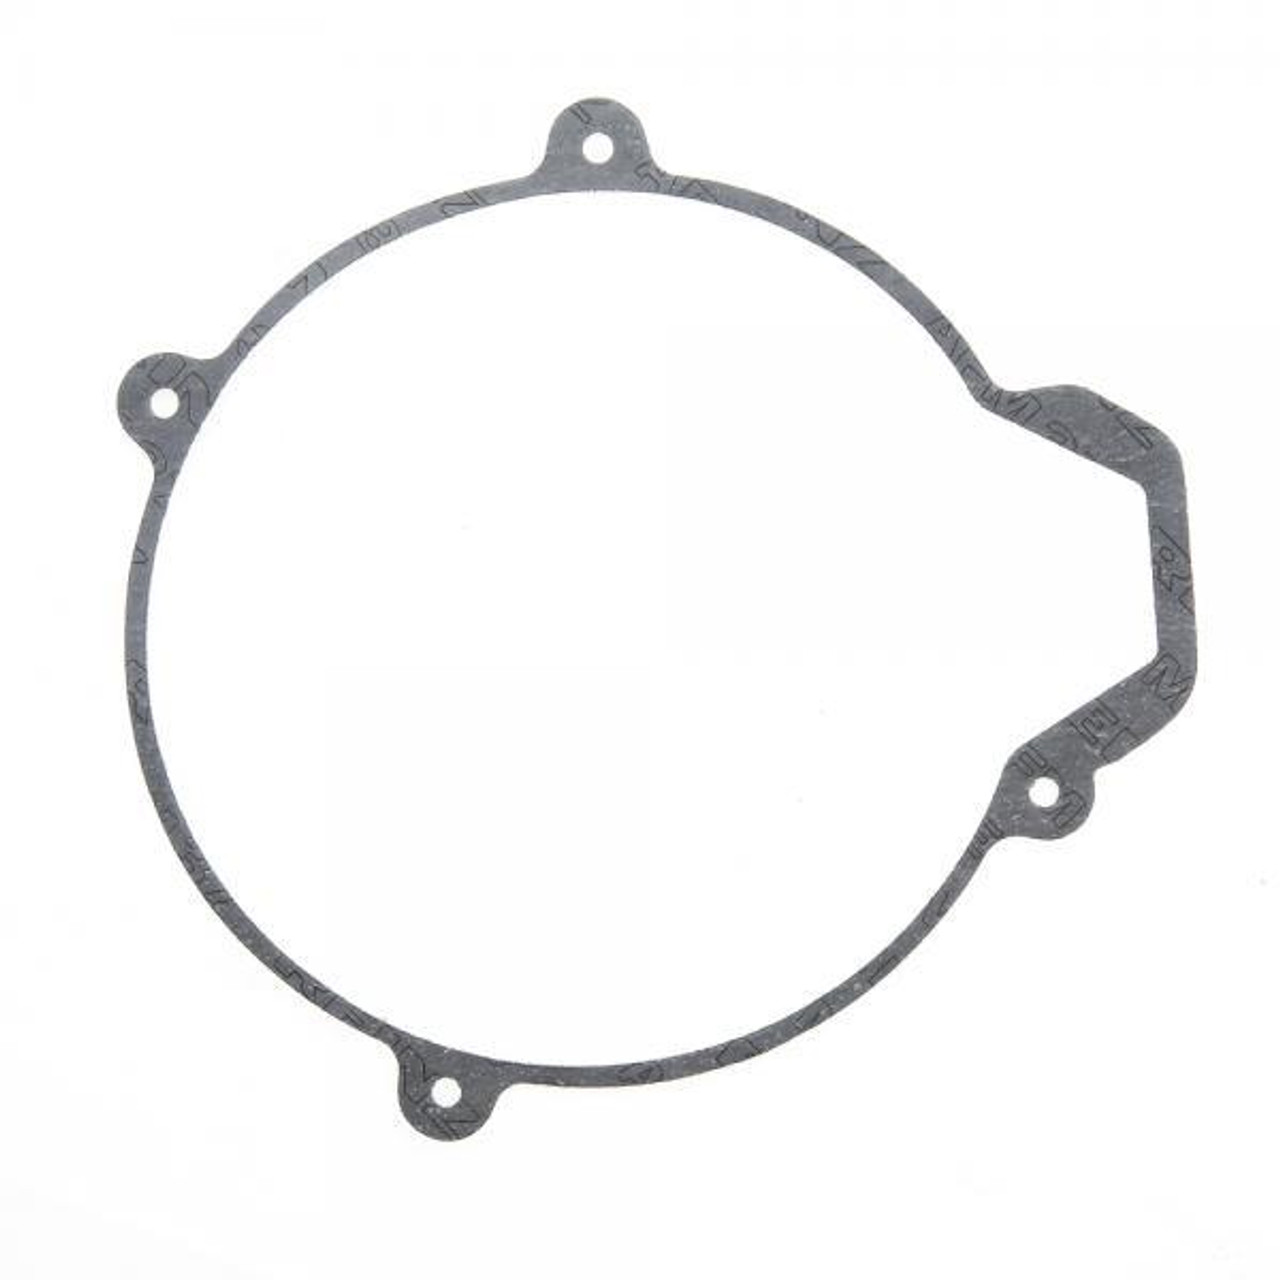 Flywheel cover gasket (CGGAS280344004) GasGas